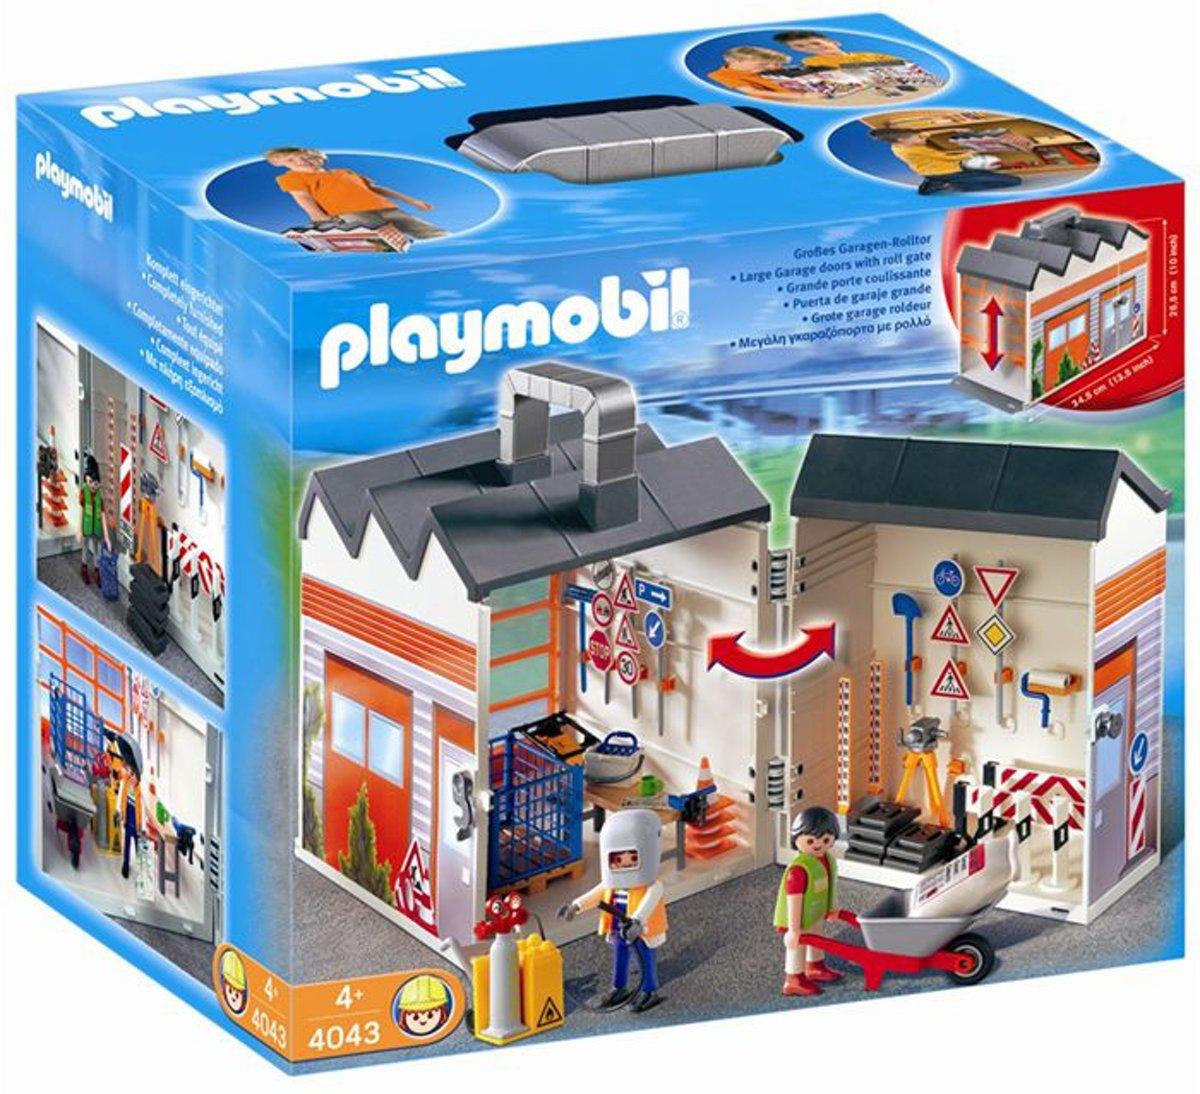 Playmobil Bouwset - 4043